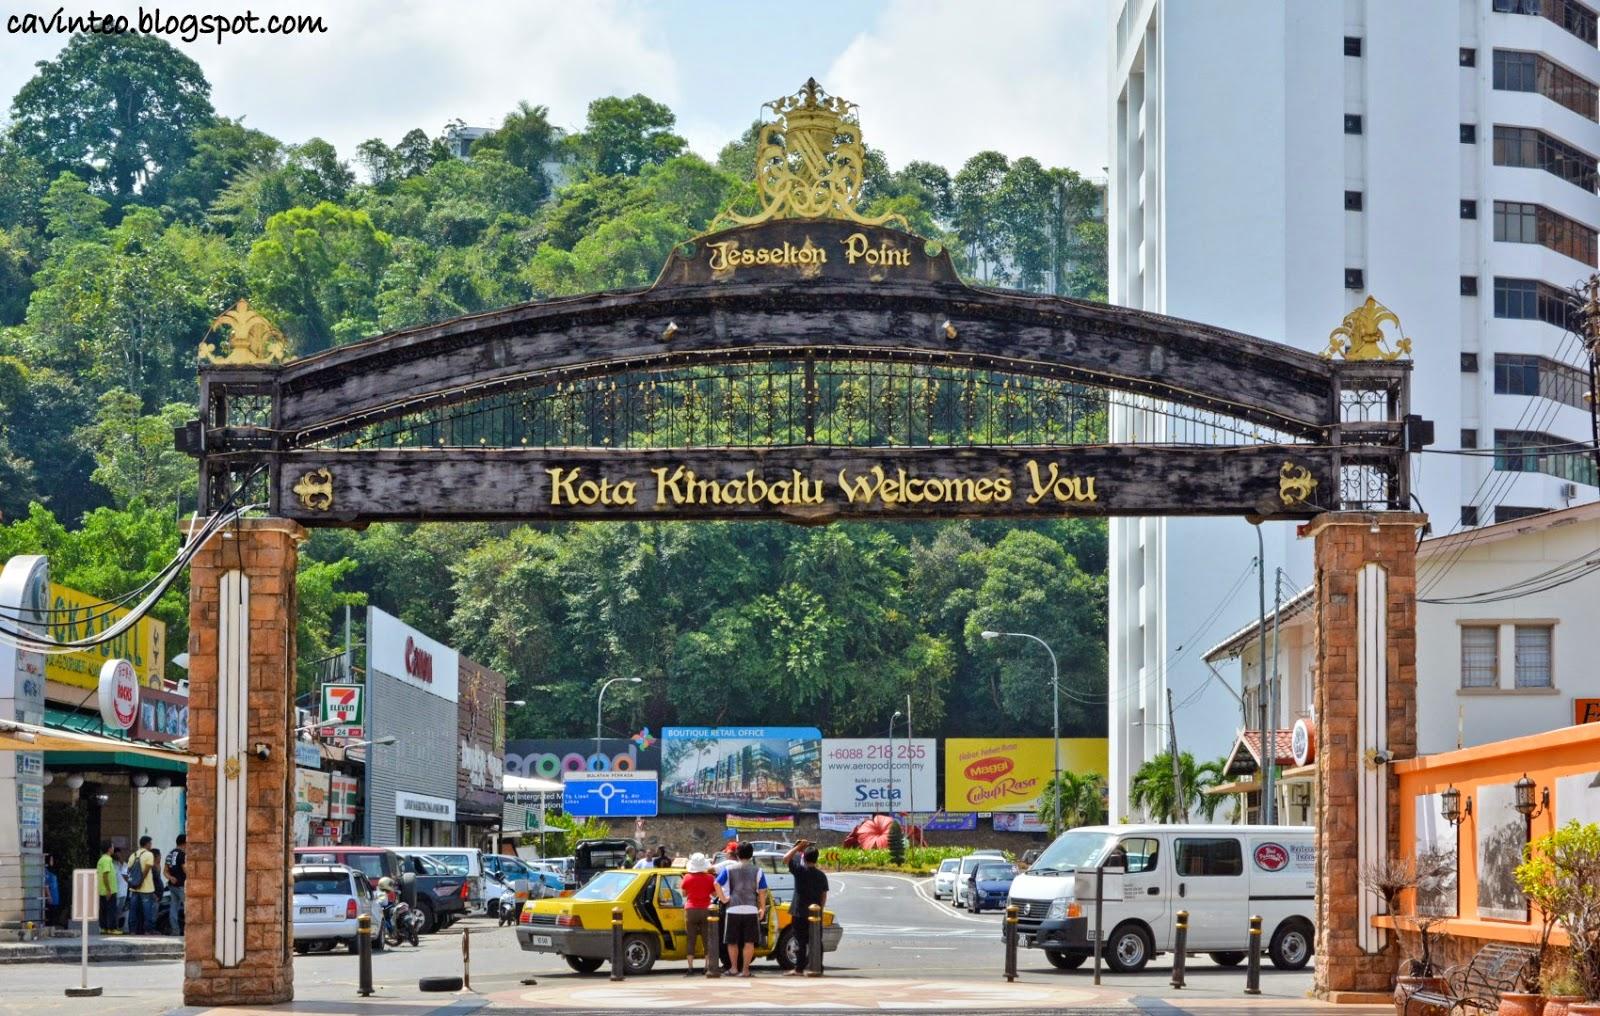 Entree Kibbles Kota Kinabalu Day 2 Of My Journey To East Malaysia